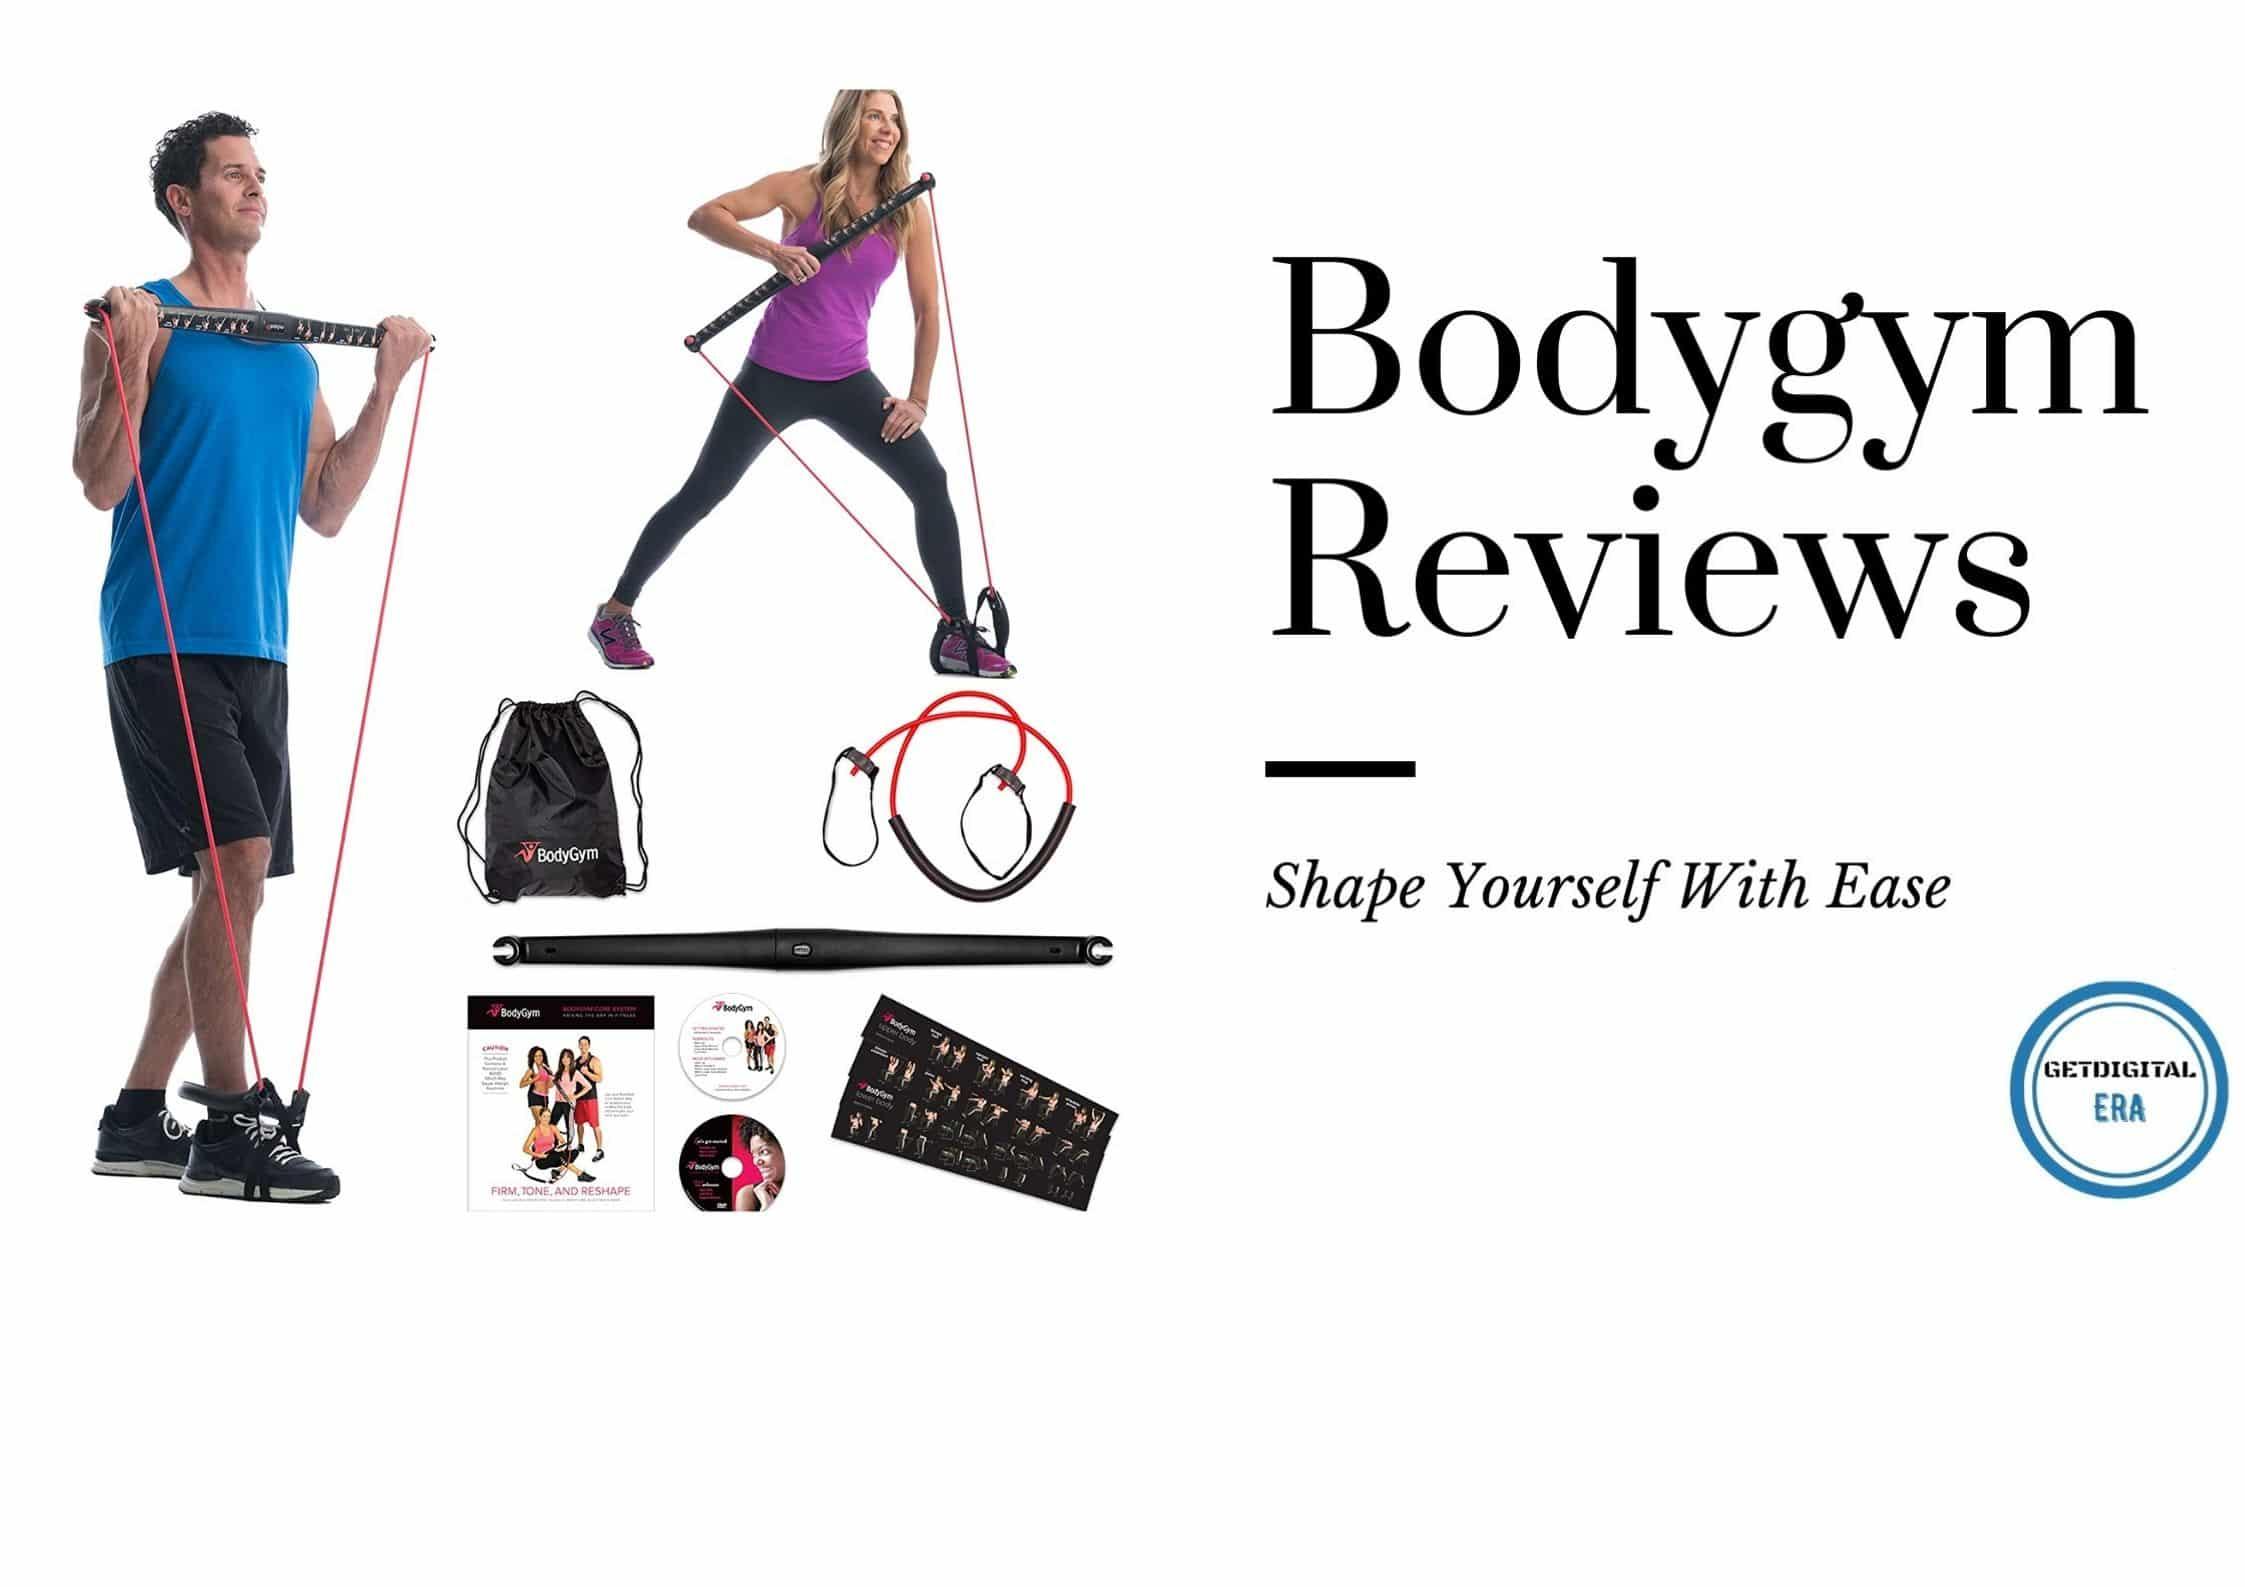 Bodygym Reviews